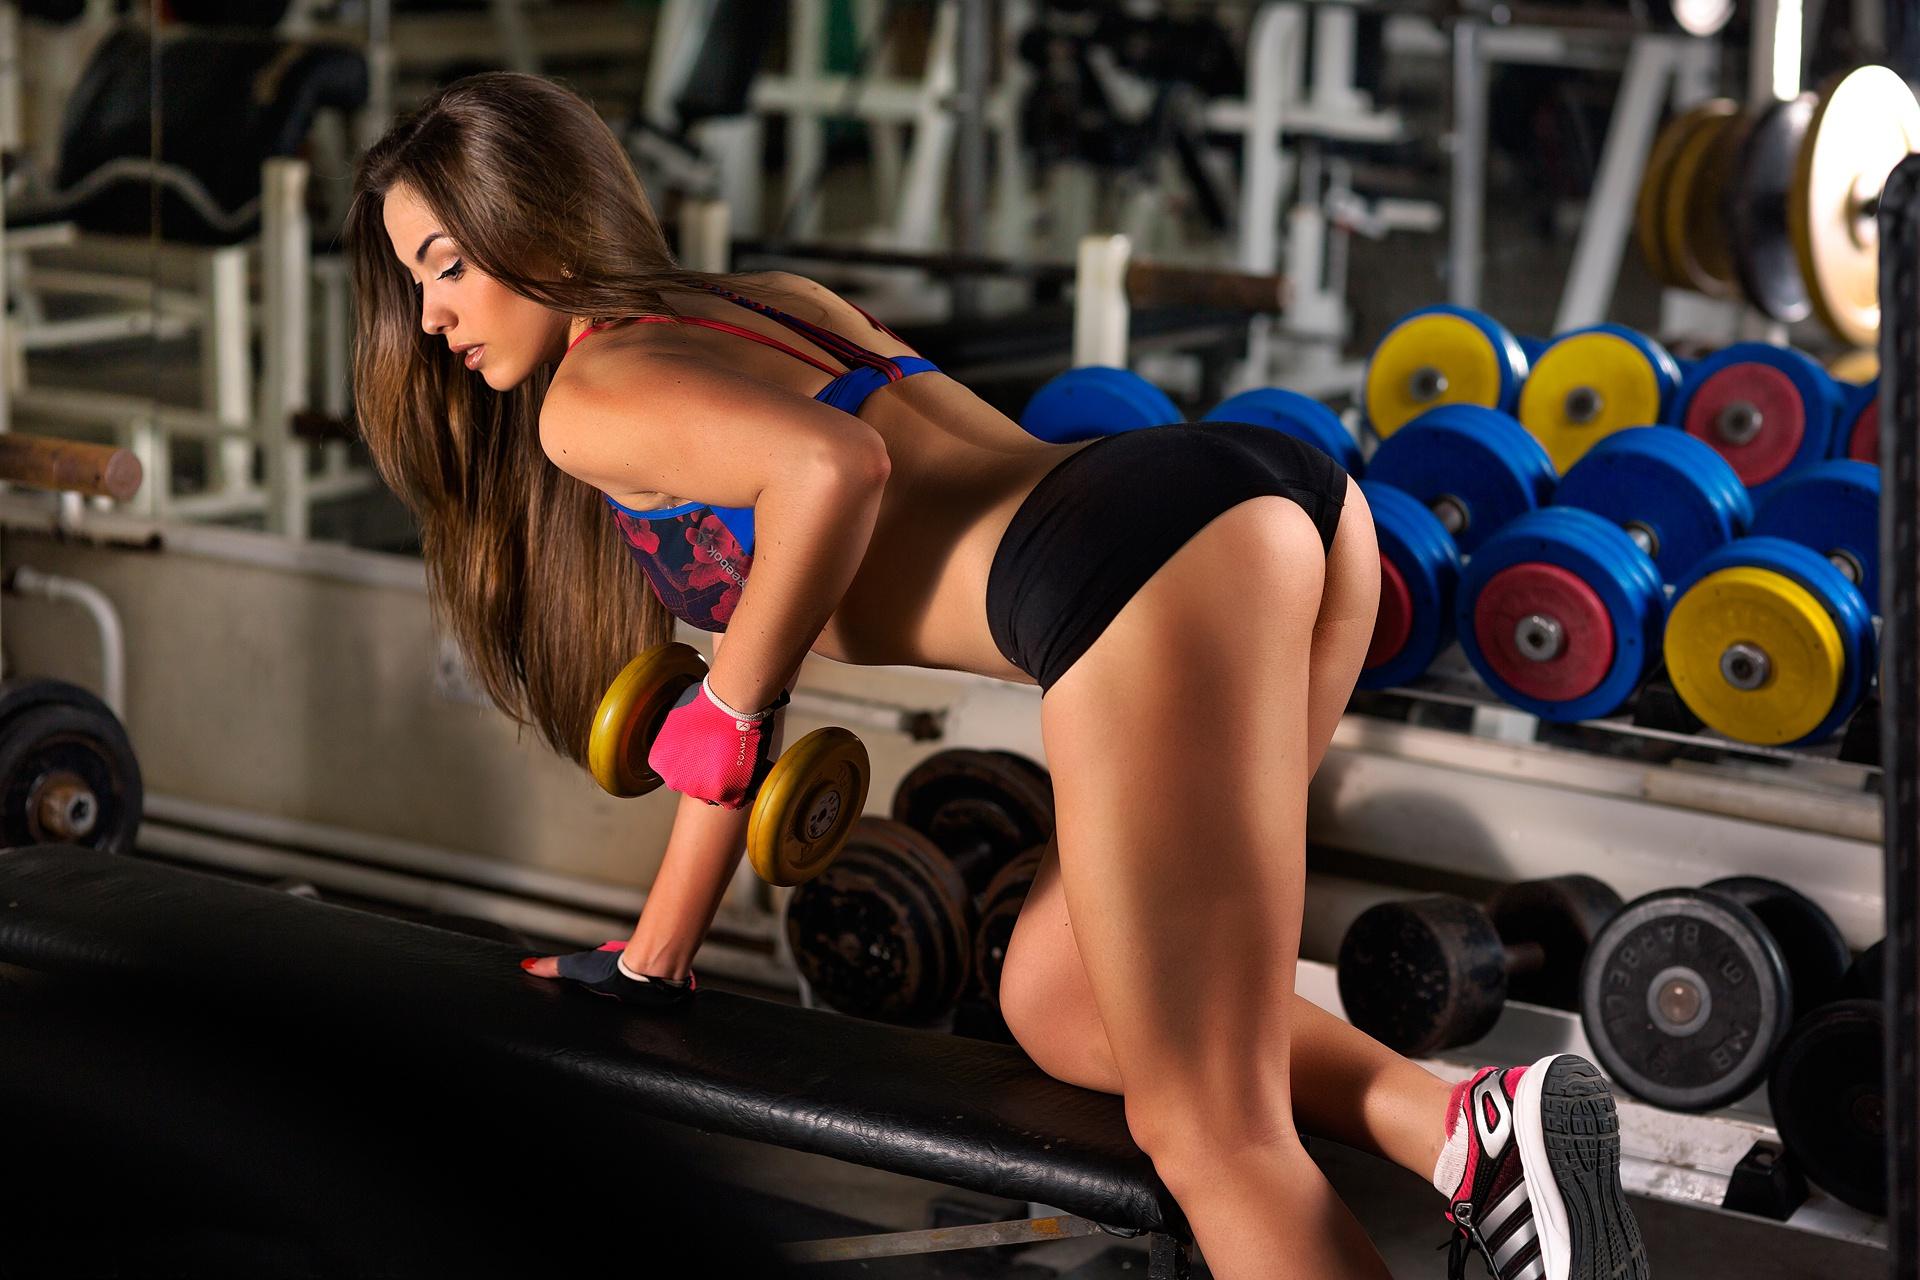 Sexy gym girl prank